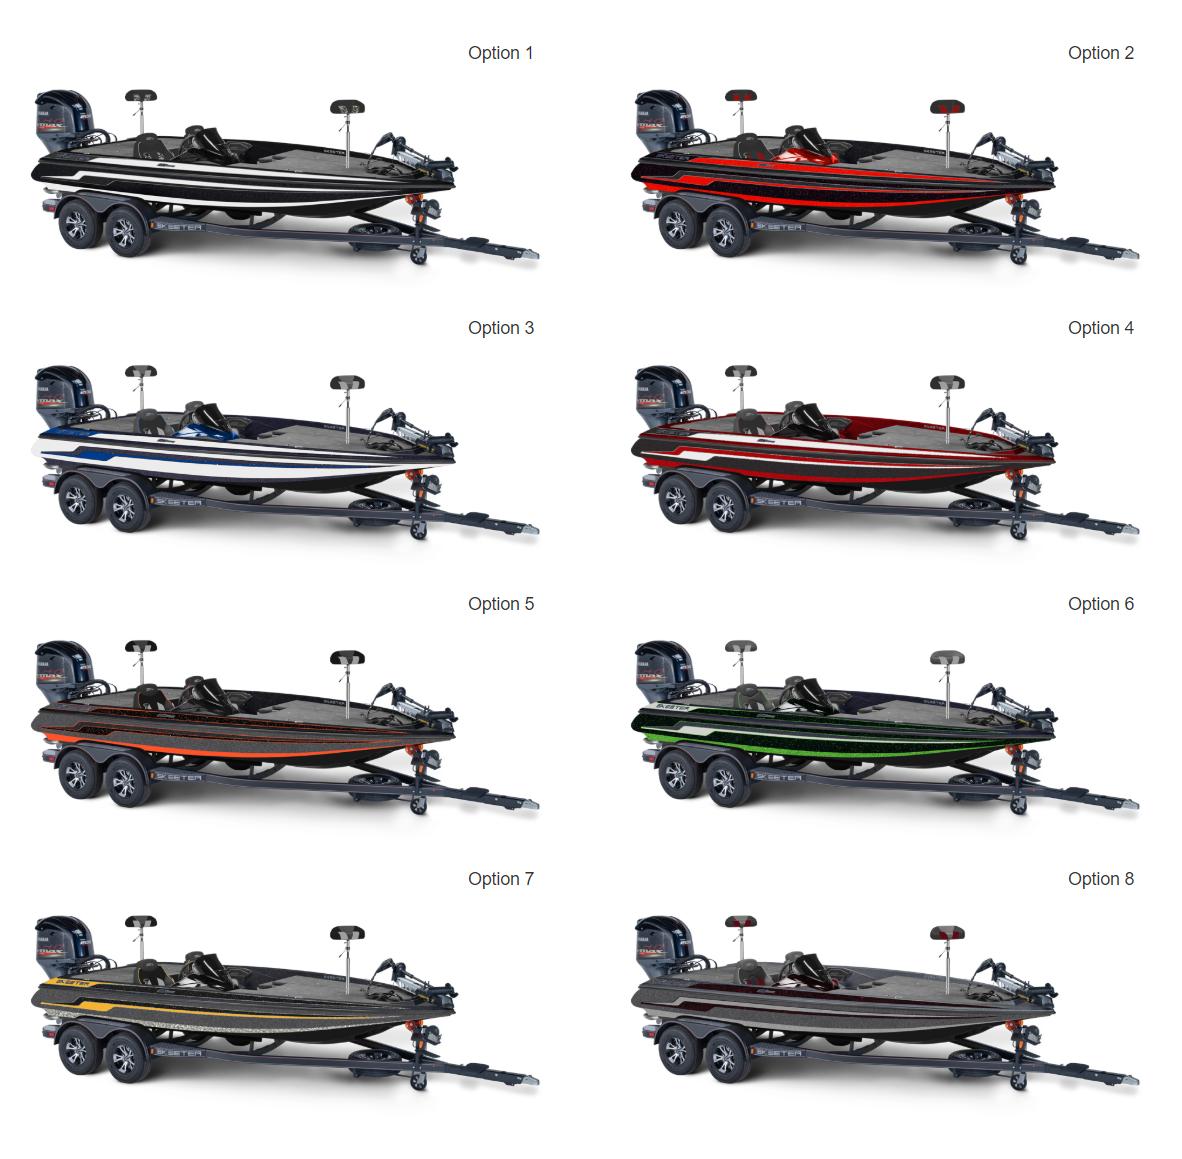 FireShot Capture 173 - 2019 Skeeter ZX200 Bass Boat_ - https___www.skeeterboats.com_Skeeter-Boat.php